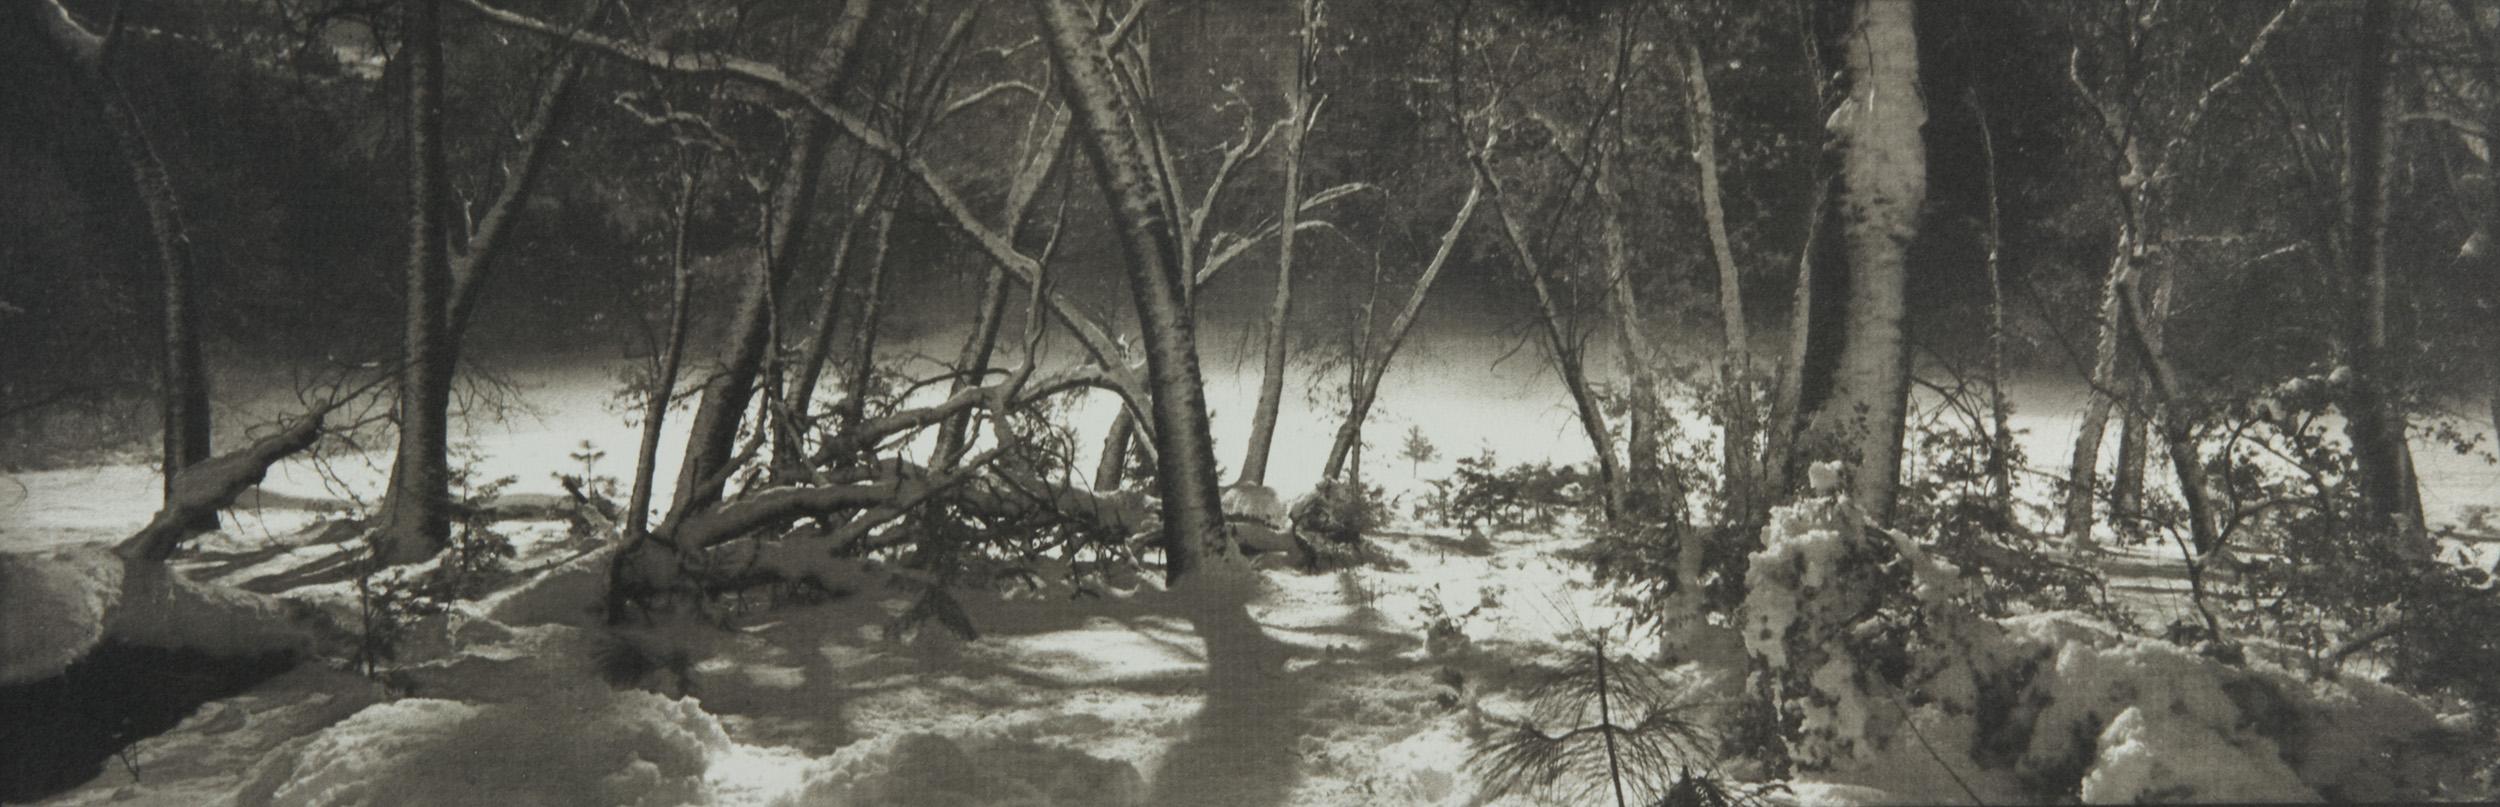 Awhanee Meadow